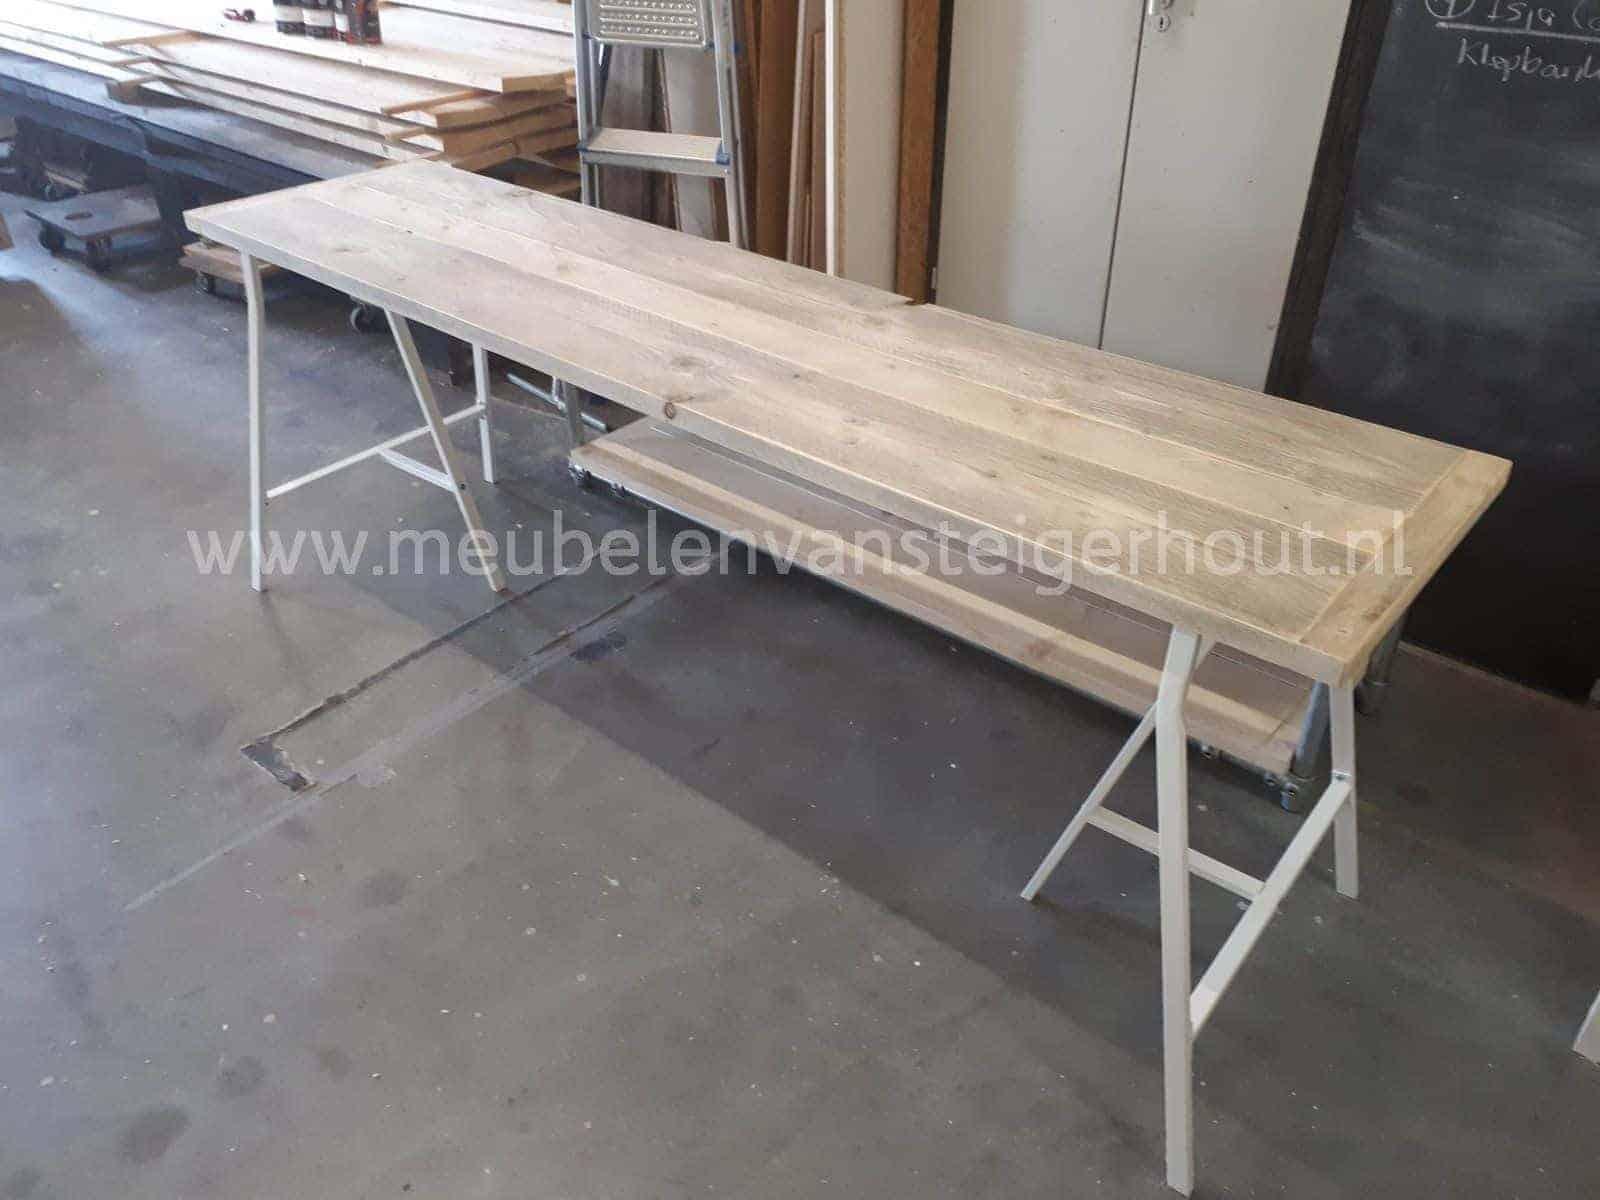 Houten Schragen Voor Bureau.Steigerhouten Bureau Op Metalen Schragen Meubelen Van Steigerhout